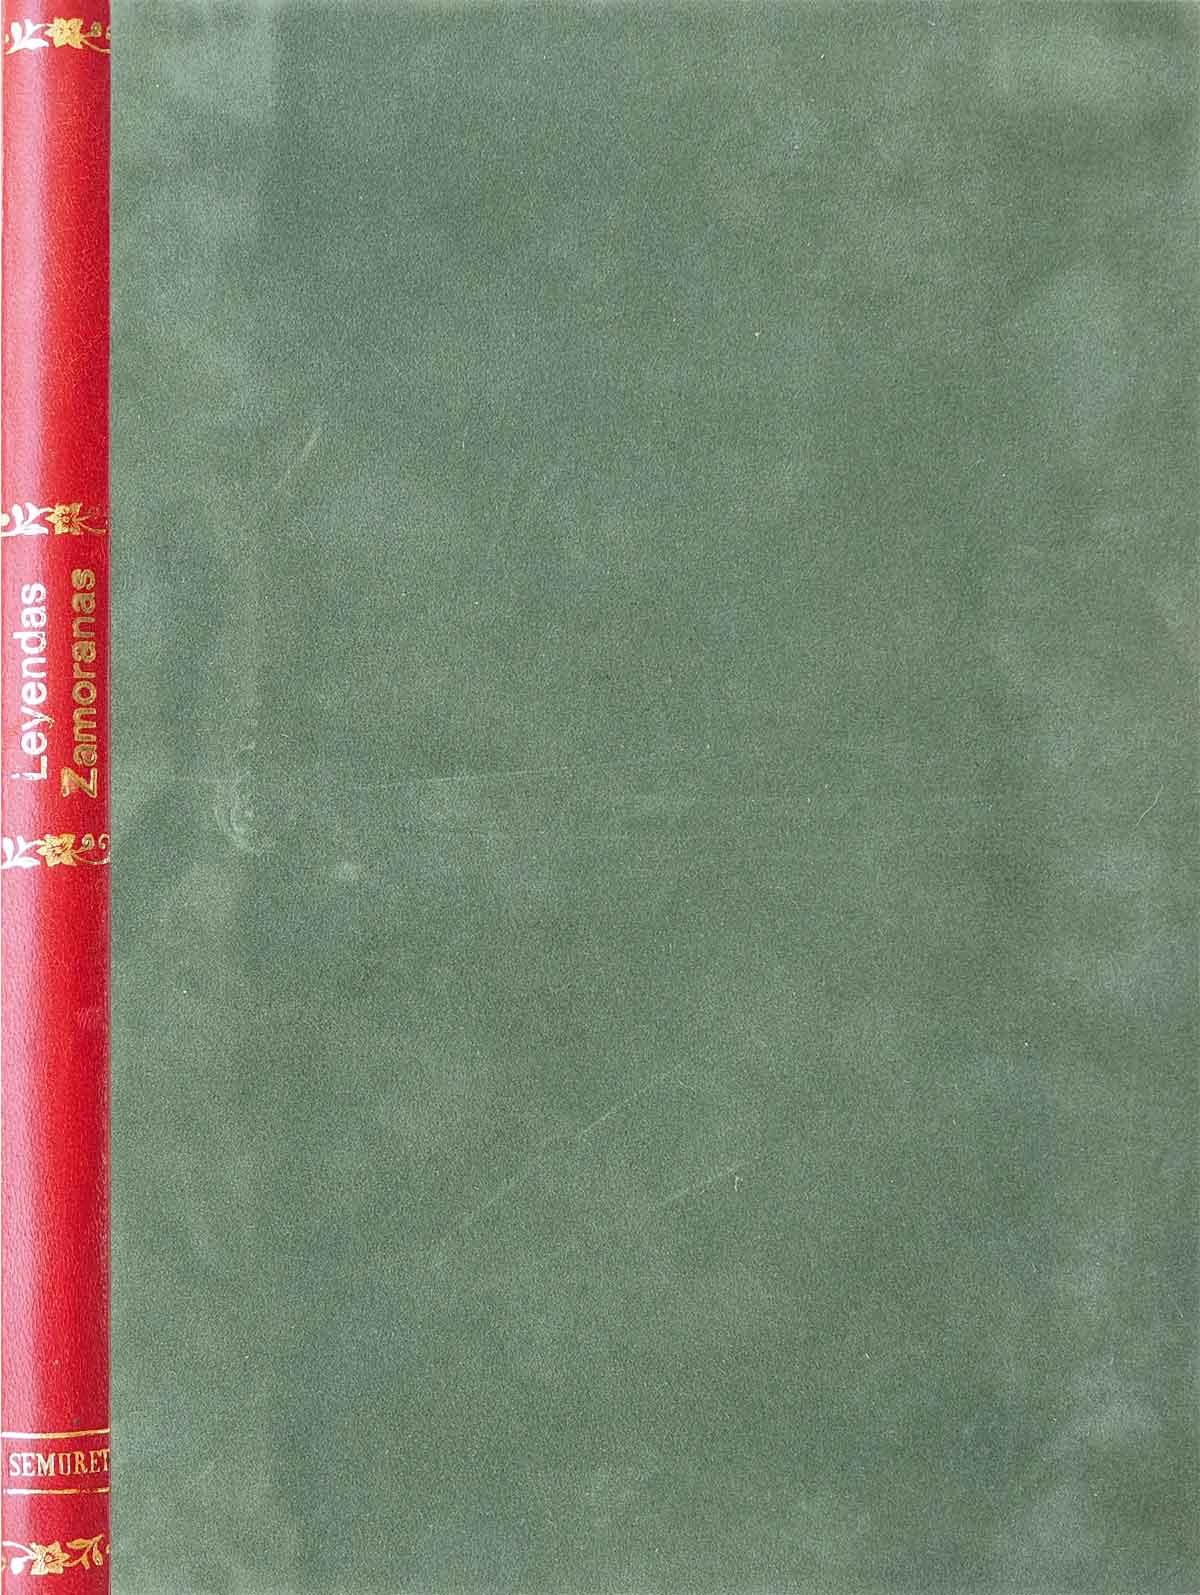 leyendas-zamoranas-florian-ferrero-concha-ventura-editorial-semuret